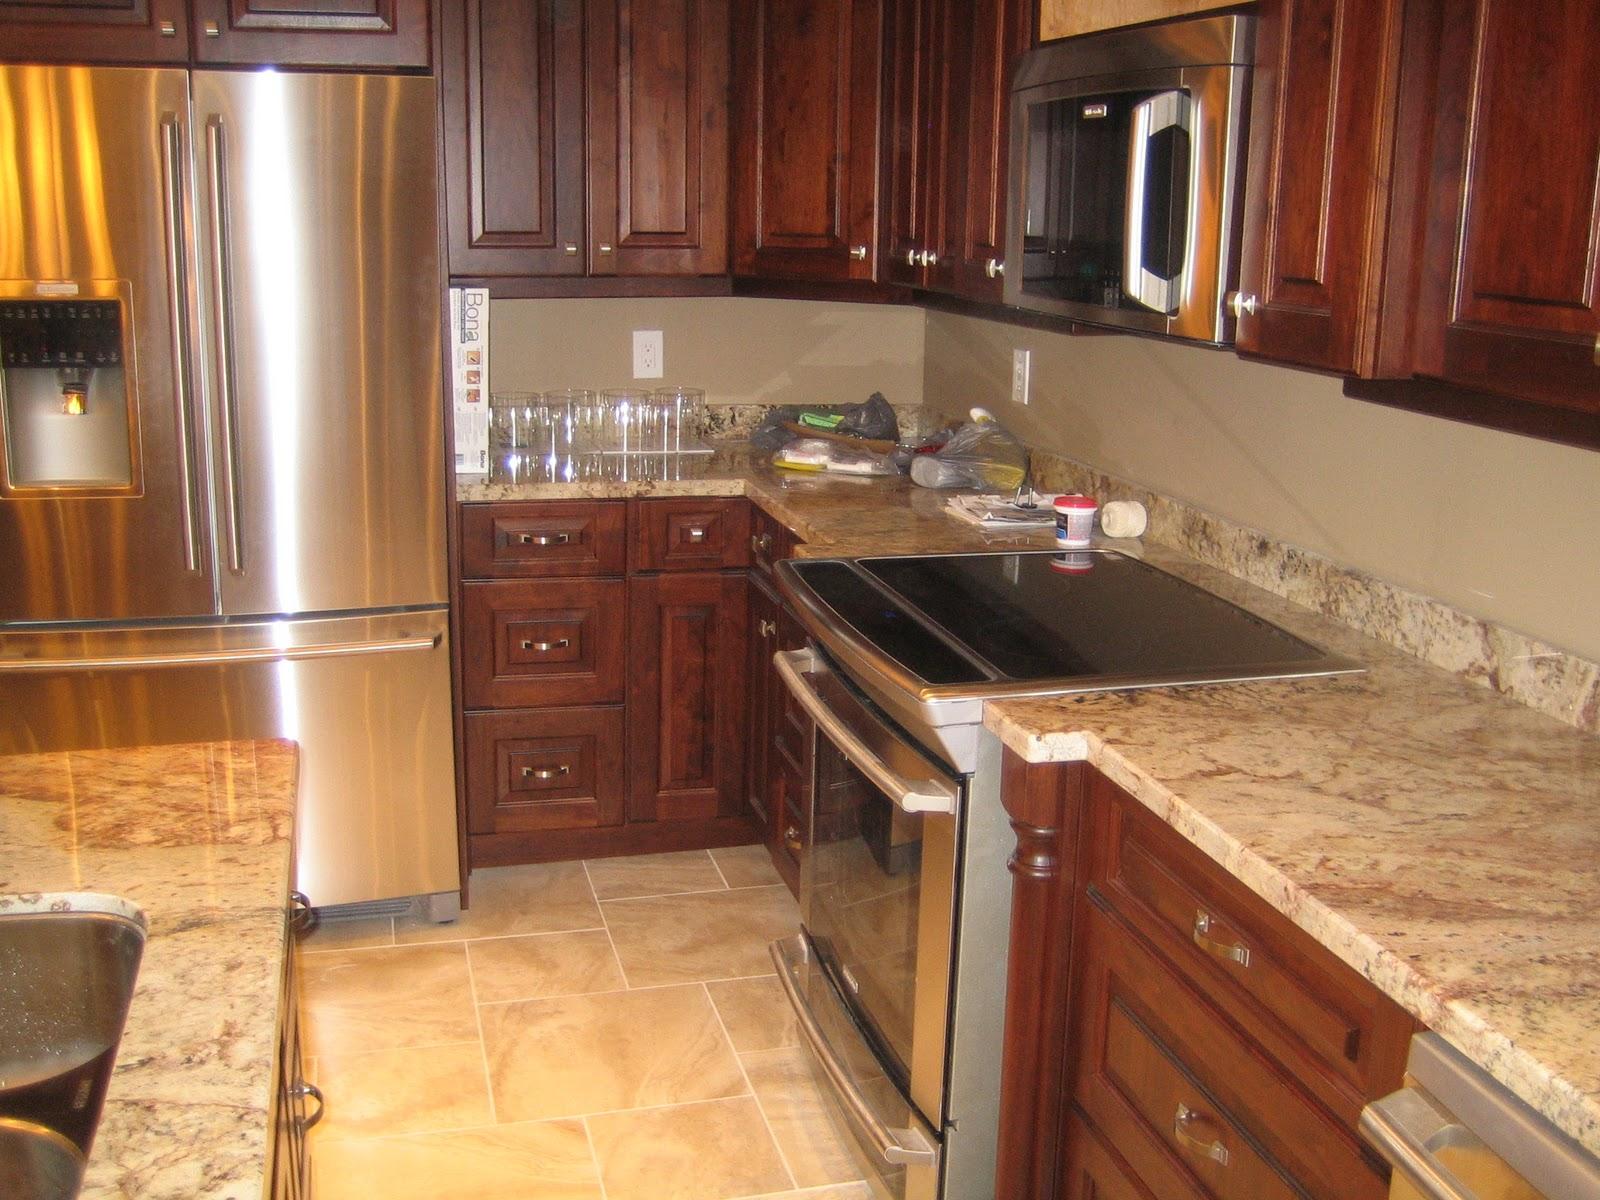 High gloss kitchens mastercraft kitchens - Solid Walnut Cabinet Doors Plywood Walnut Veneer Cases